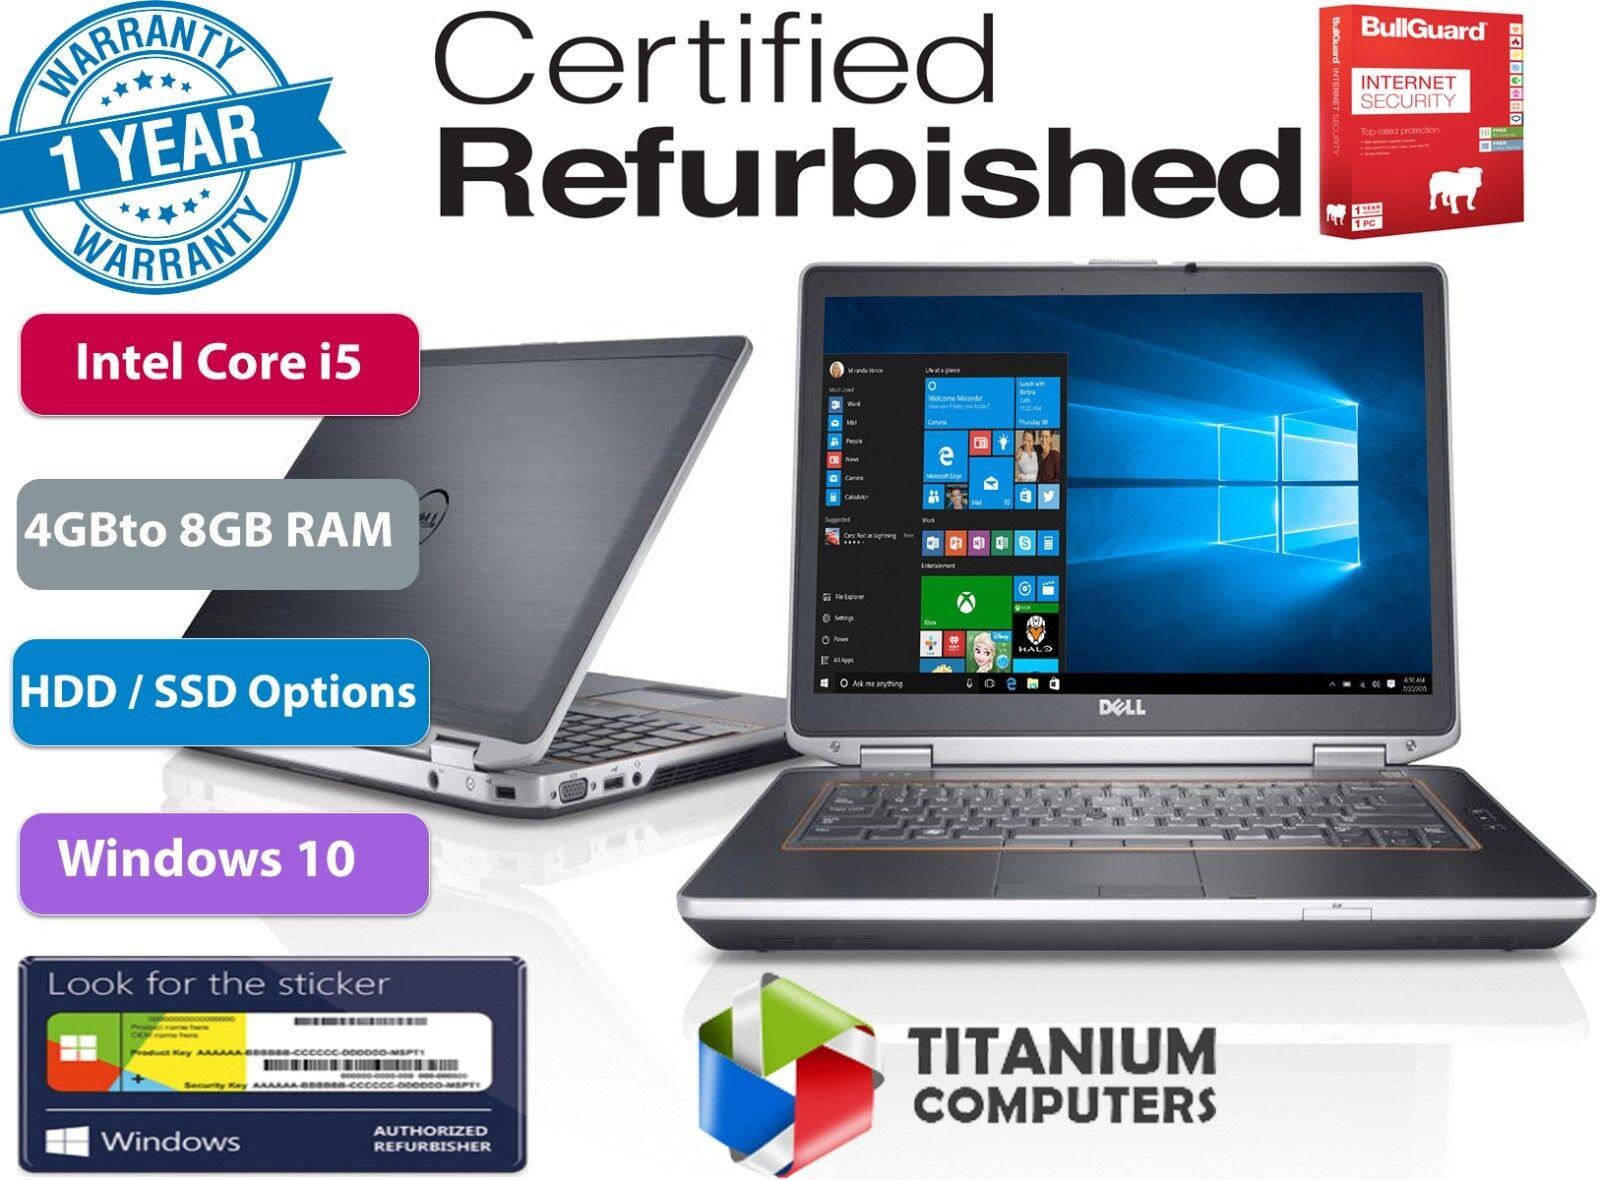 Details about HP Elitebook 8470p 14